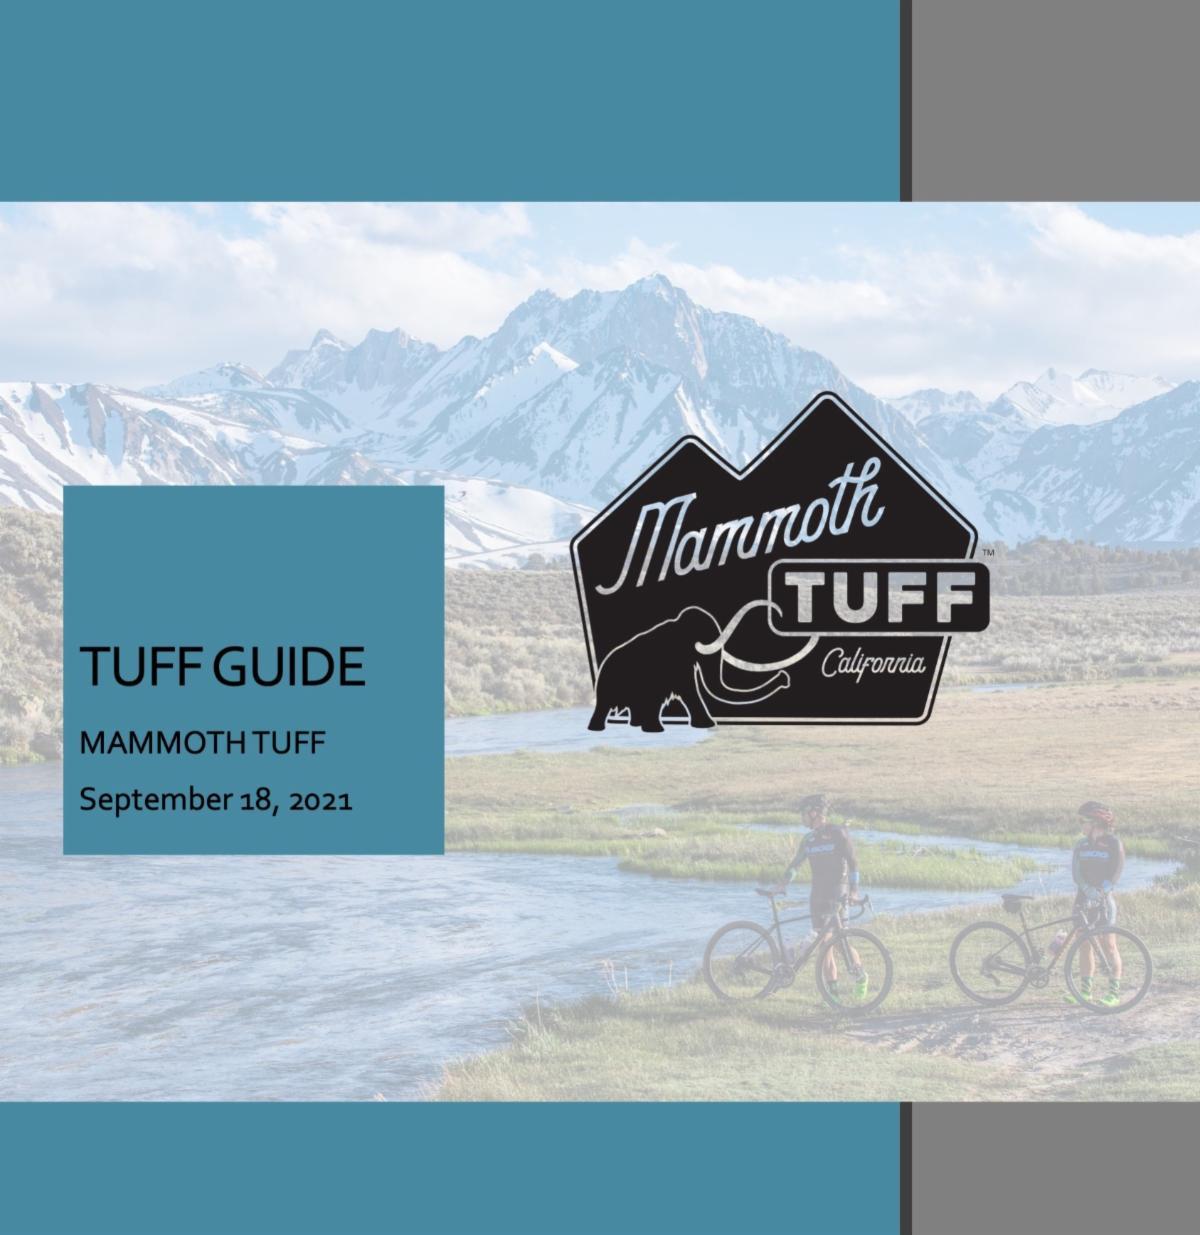 Rider Guide 1 copy.jpg